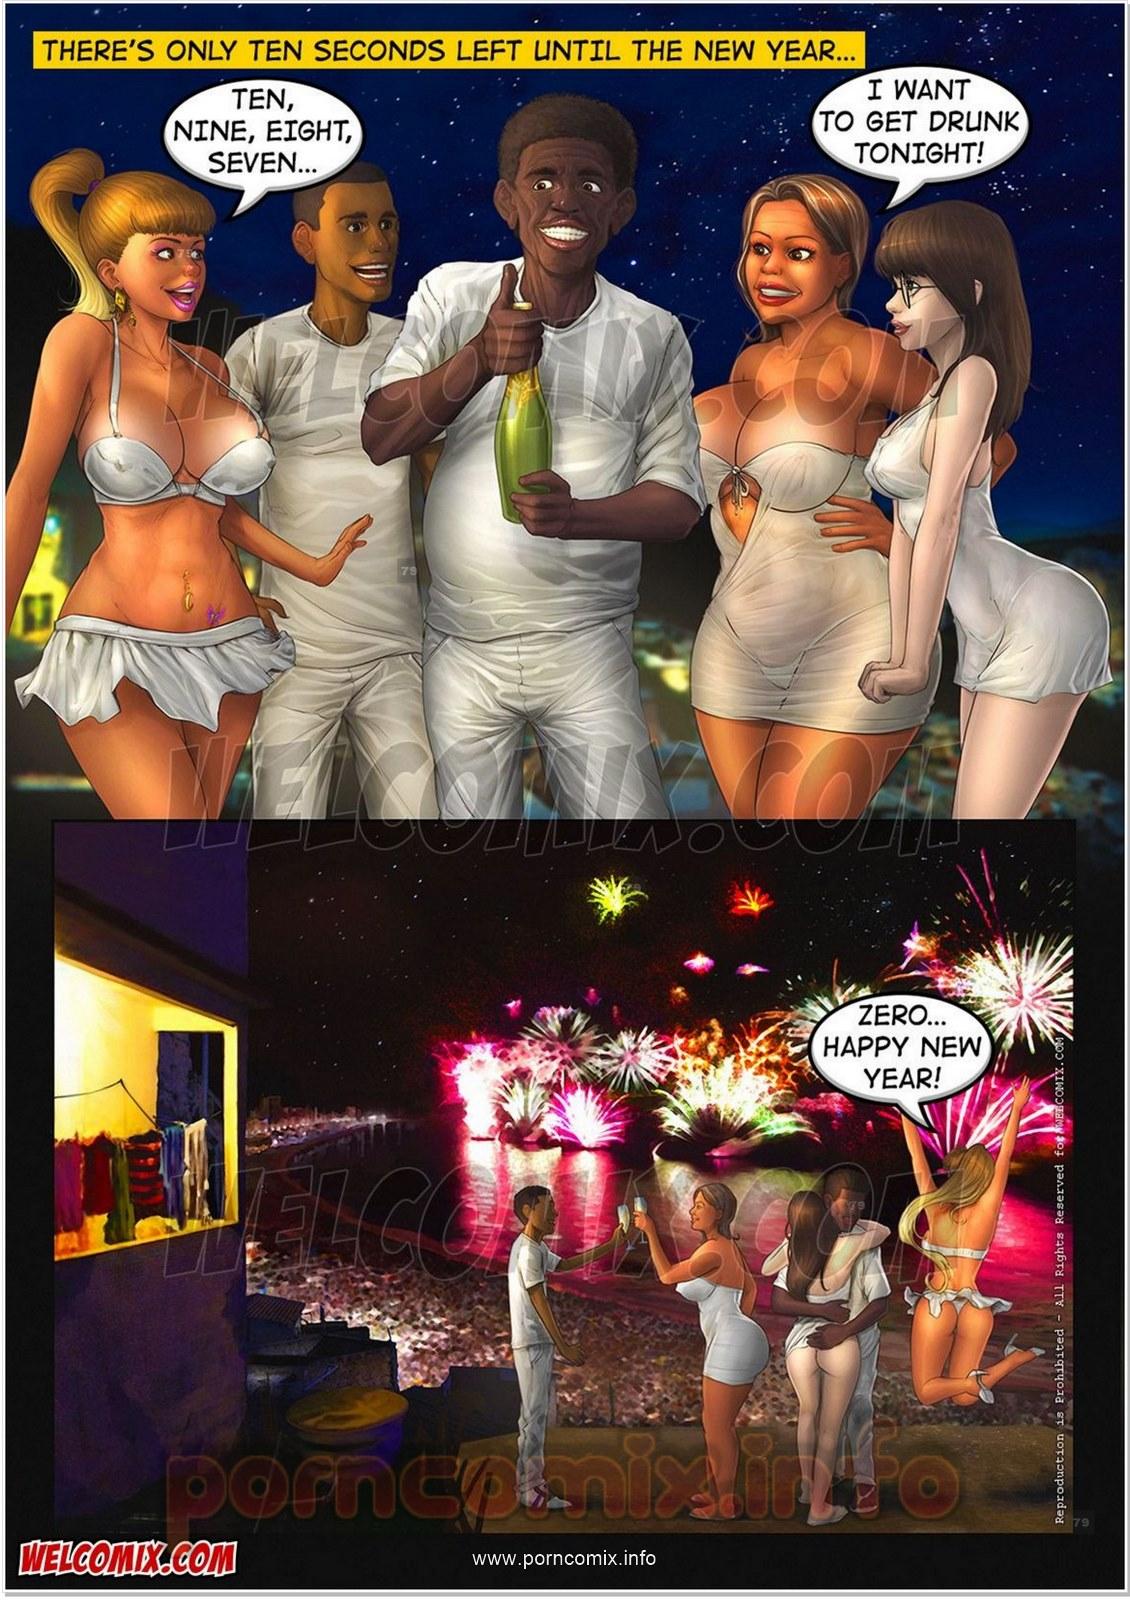 Handjob blowjob parties